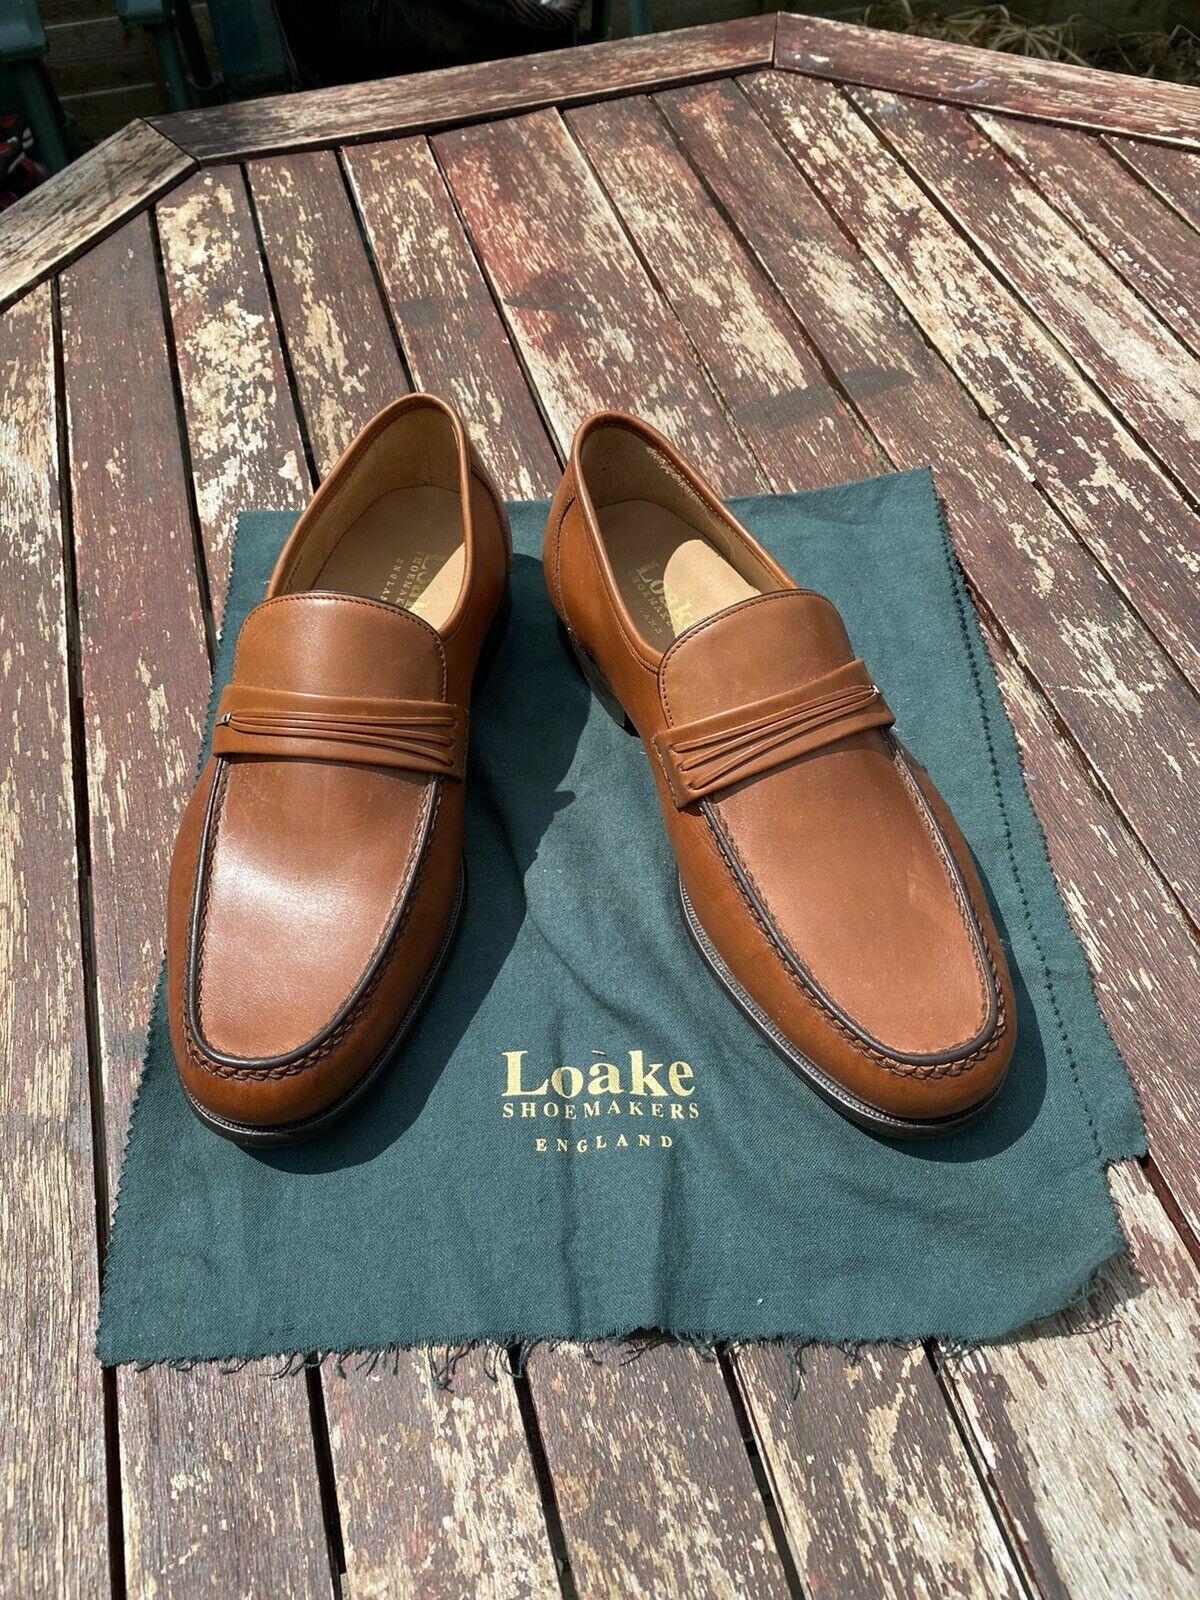 LOAKE Mens Palermo ** Slip-On - Loafer - Driving Shoes ** UK 8.5 / US 9.5 G